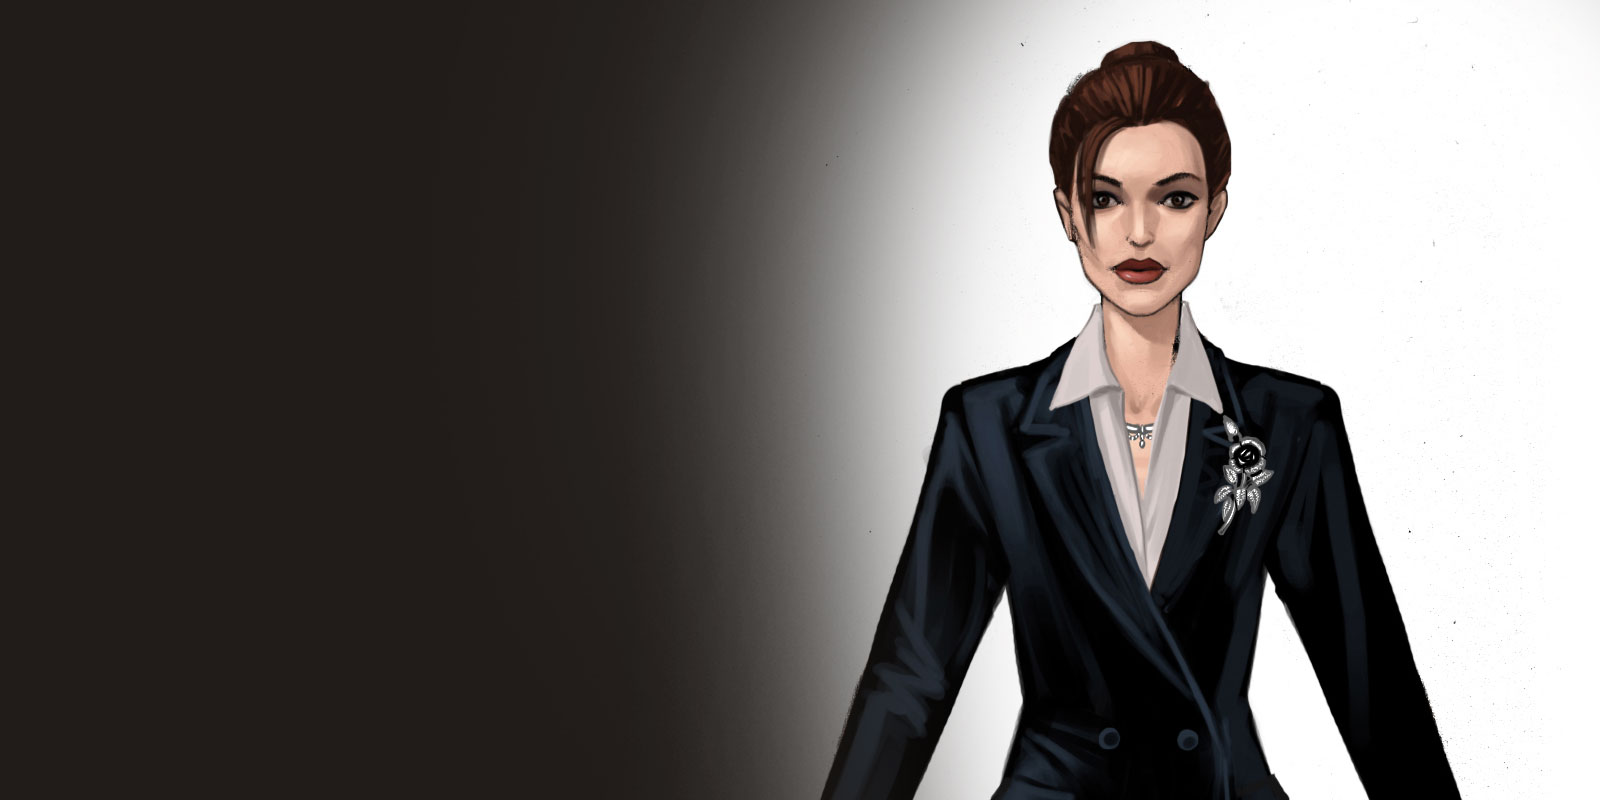 Amelia Croft